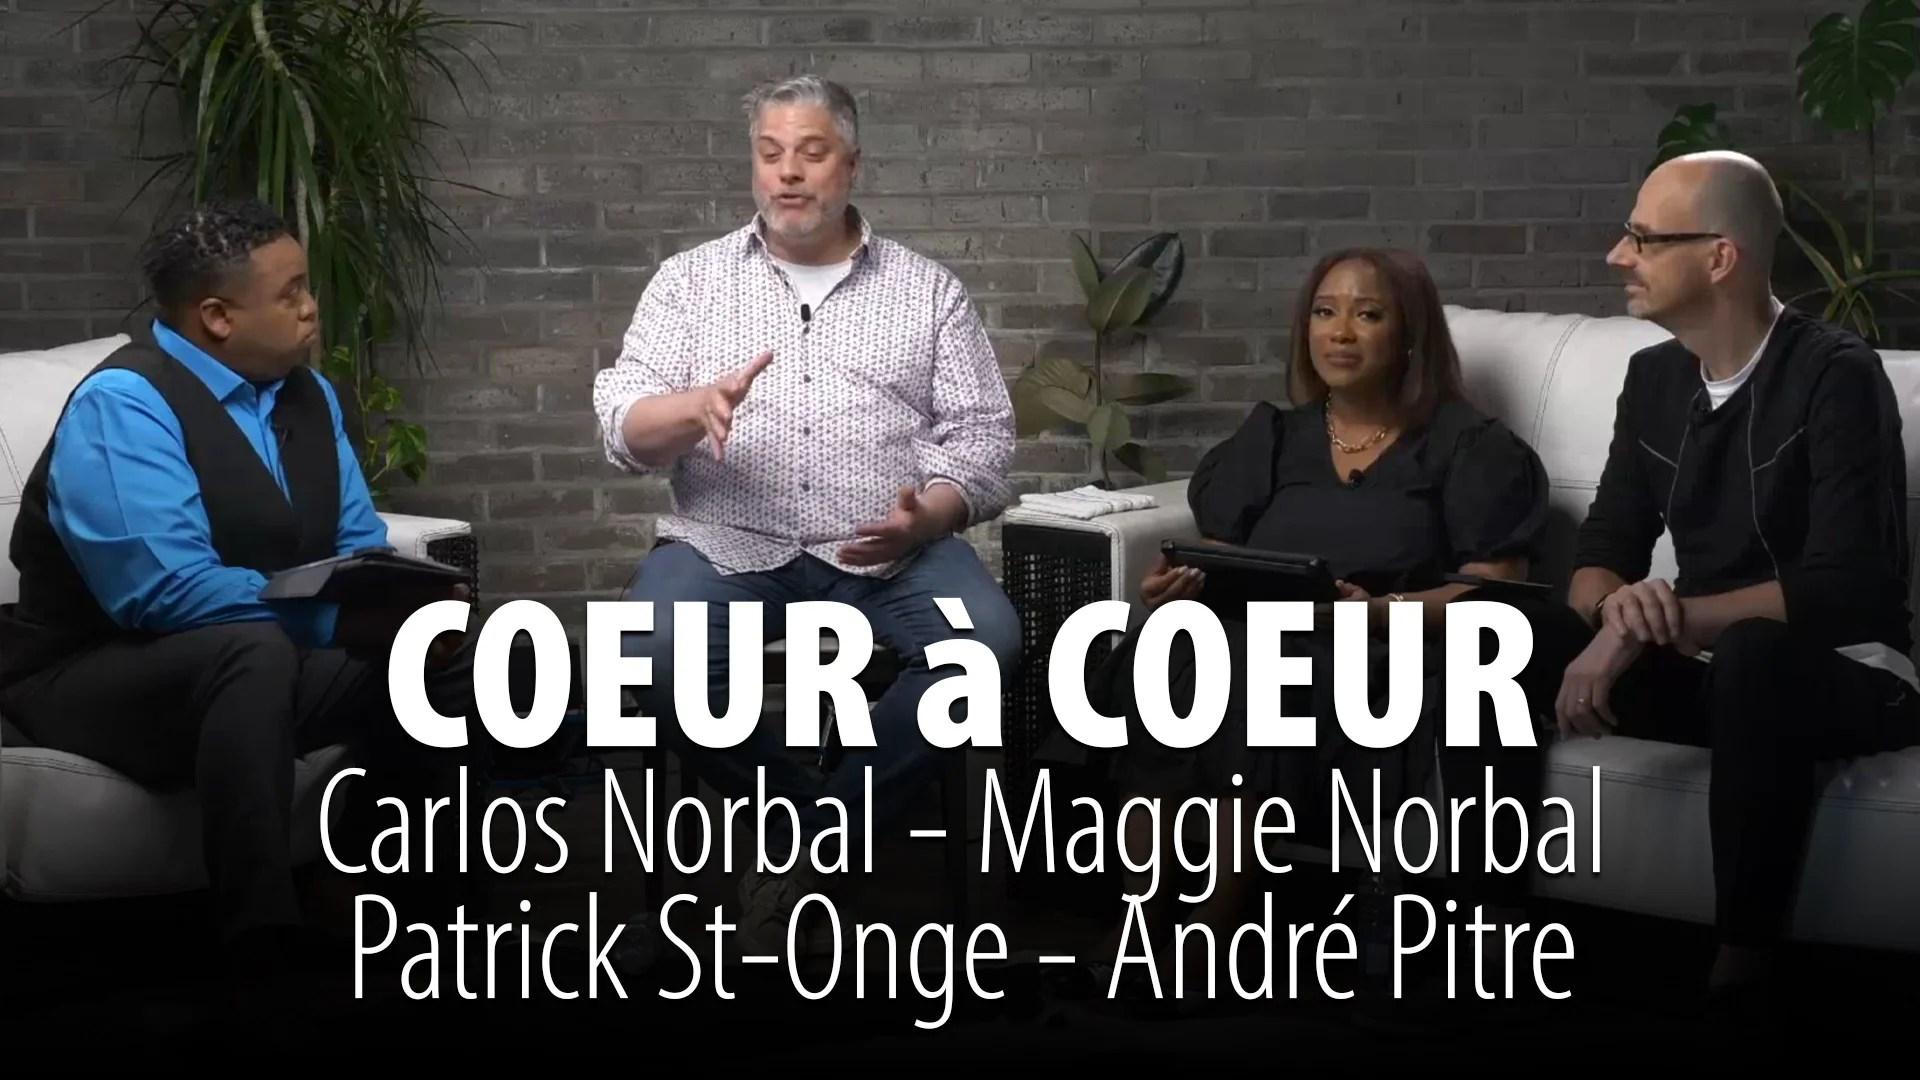 COEUR À COEUR 13 JUIN 2021 – CARLOS NORBAL – MAGGIE NORBAL – PATRICK ST-ONGE – ANDRÉ PITRE